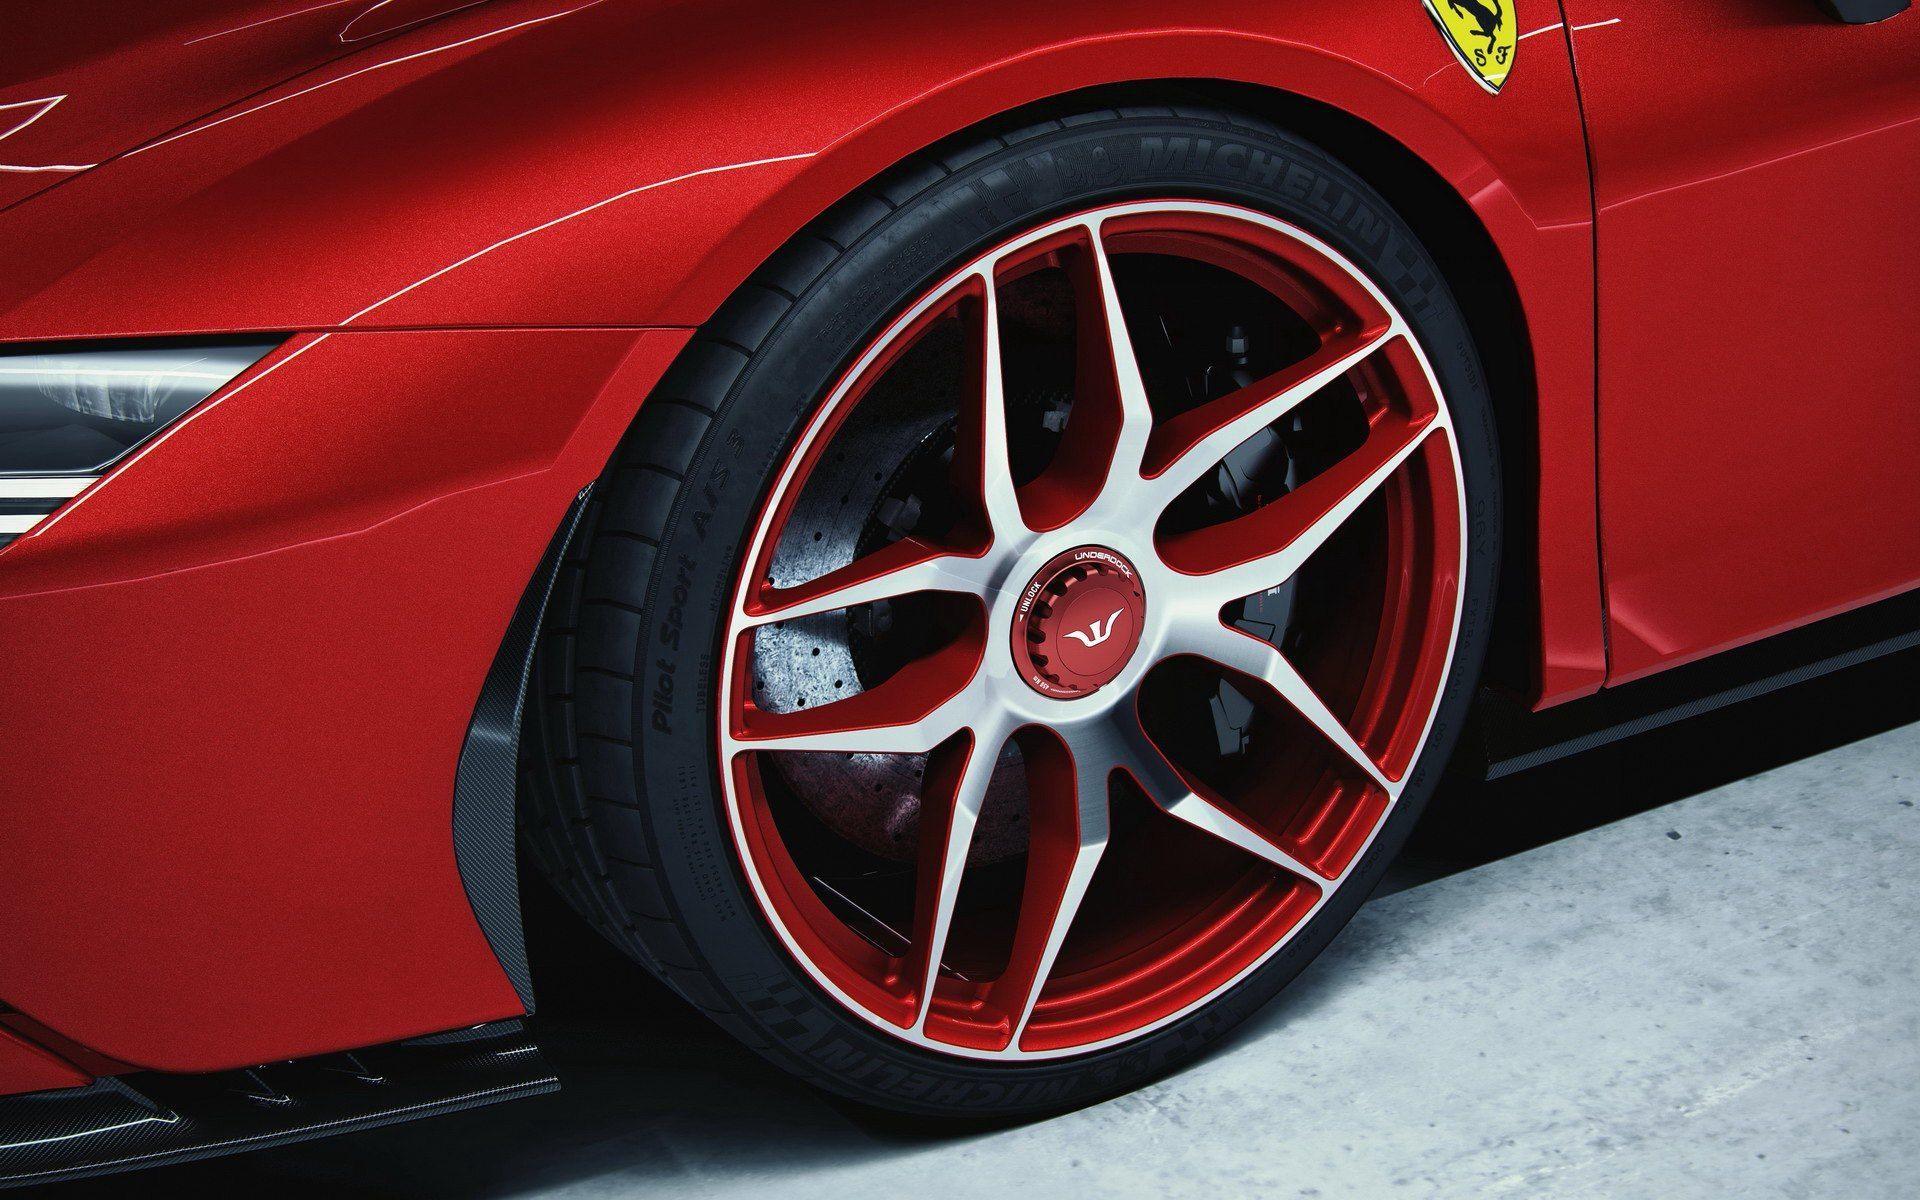 Ferrari_SF90_Stradale_by_Wheelsandmore_0014